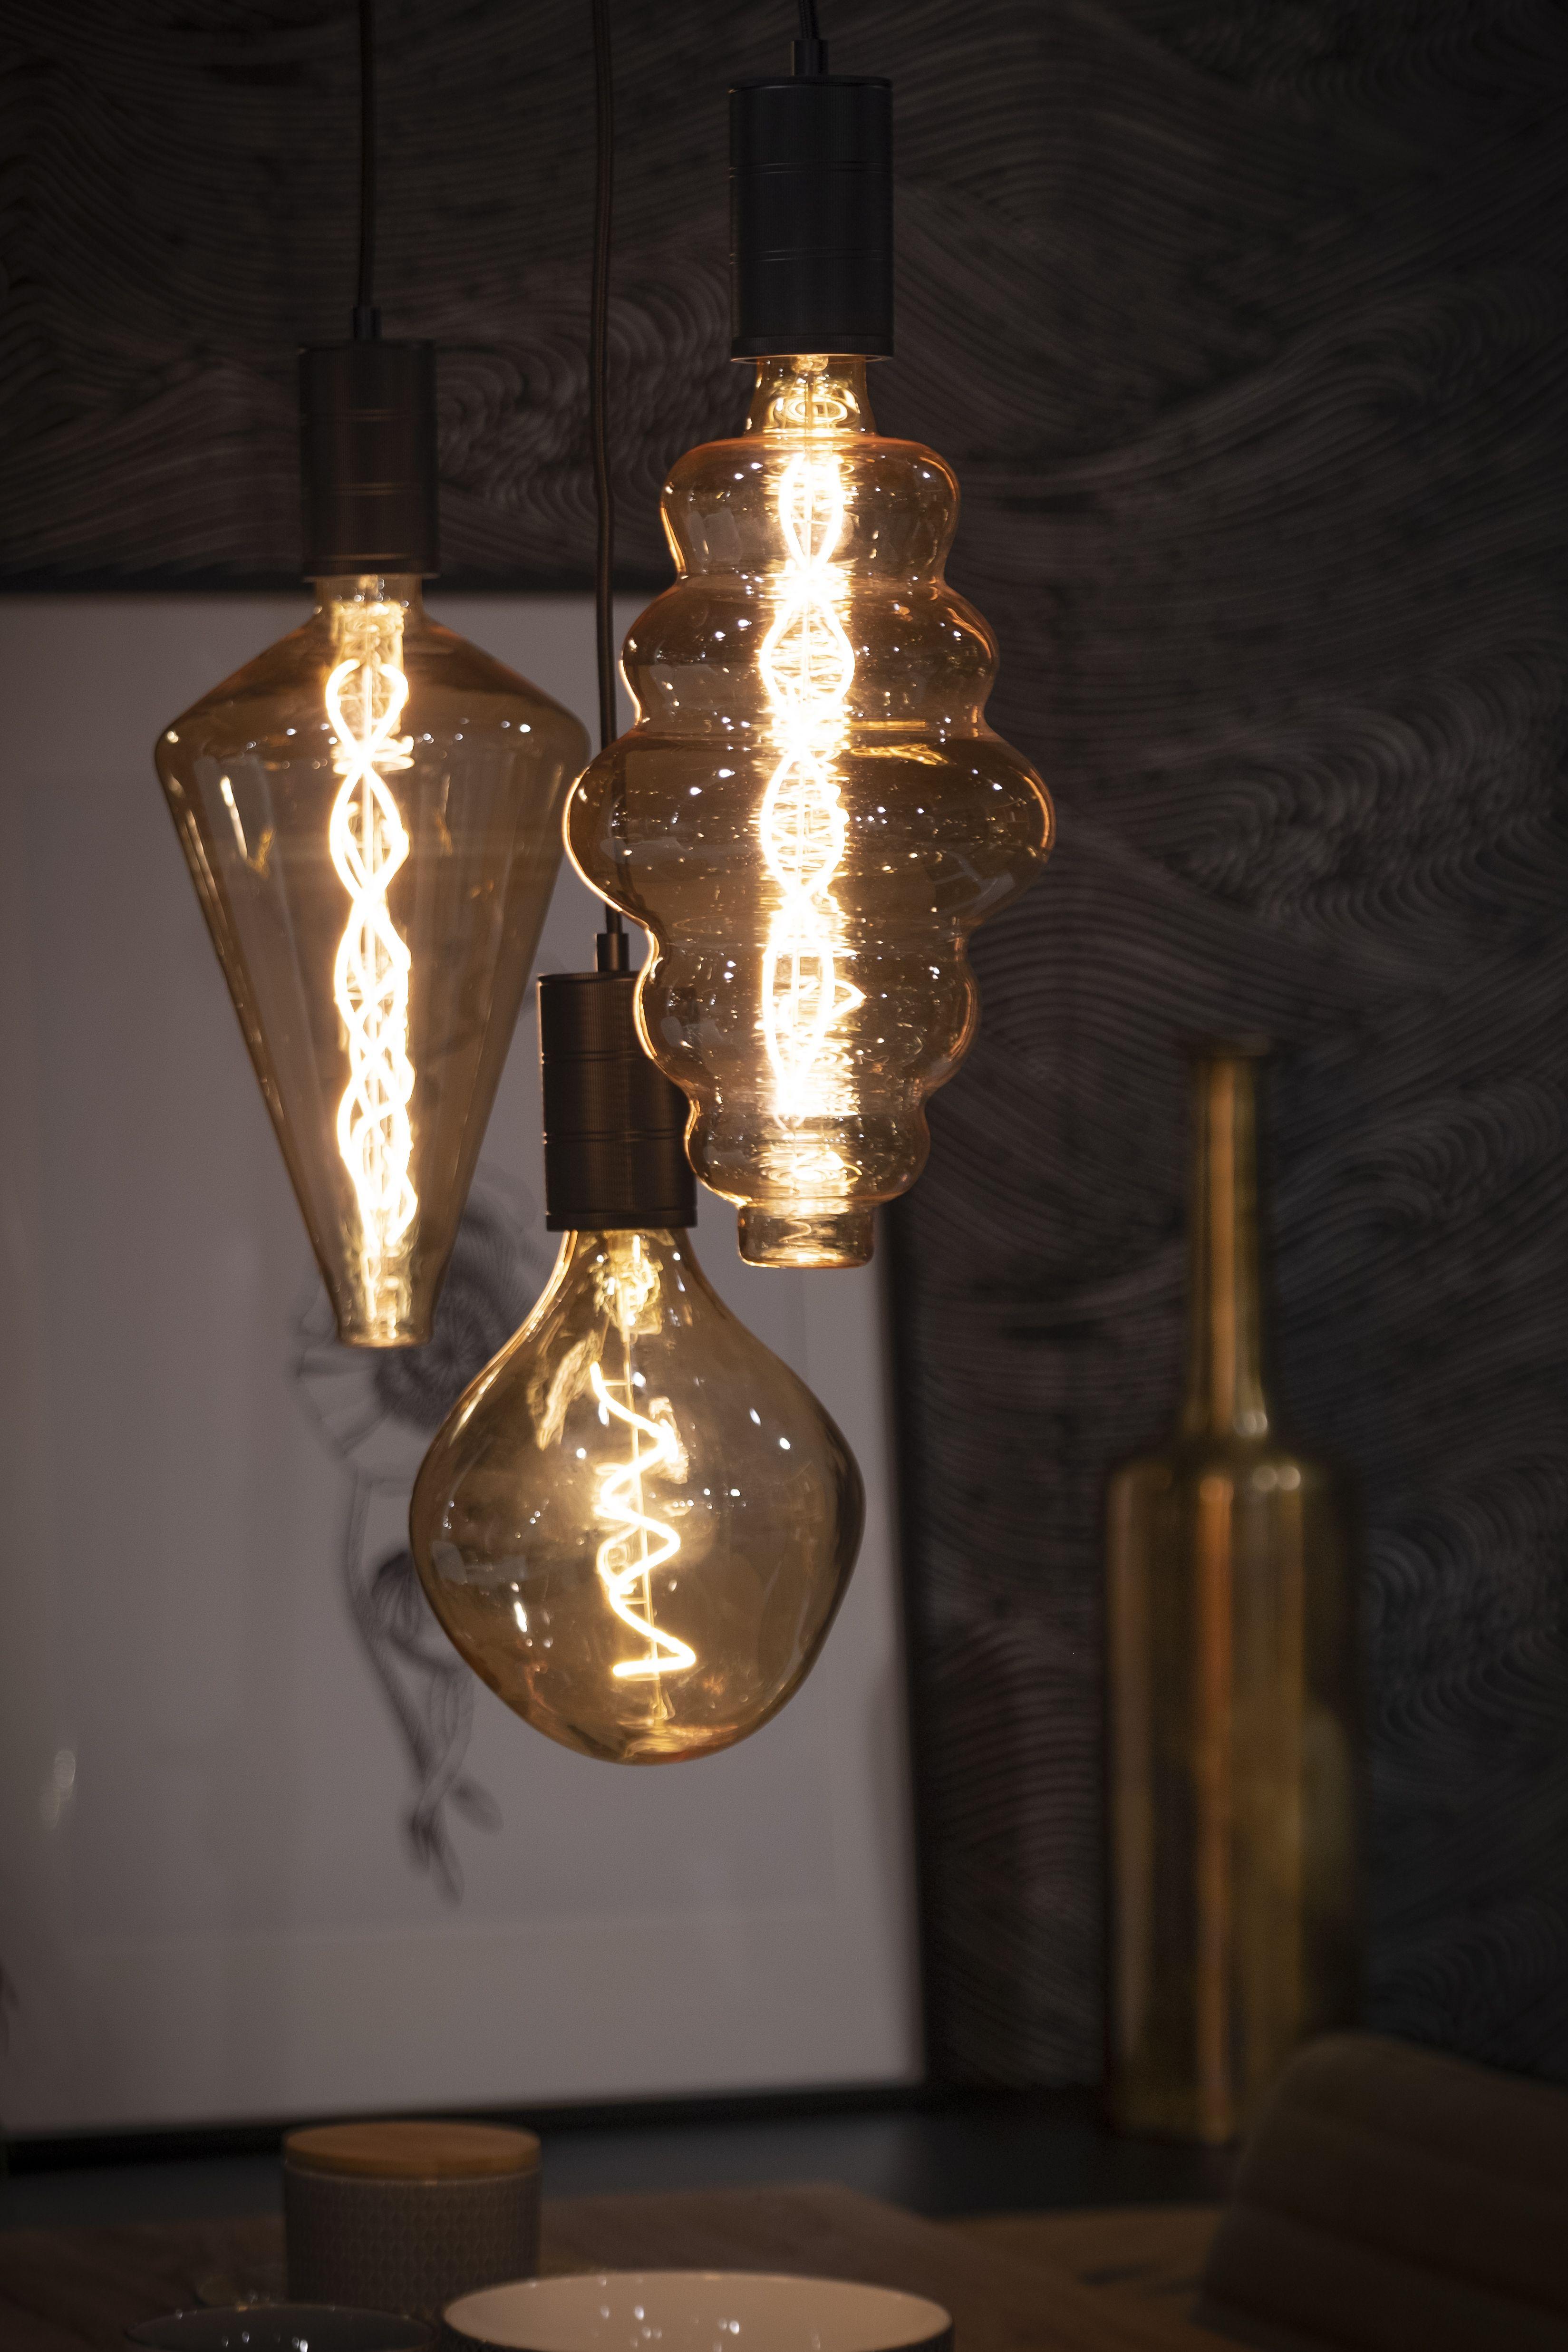 Classic Hanglampenset Goud In 2020 Hanglamp Boho Interieur Goud